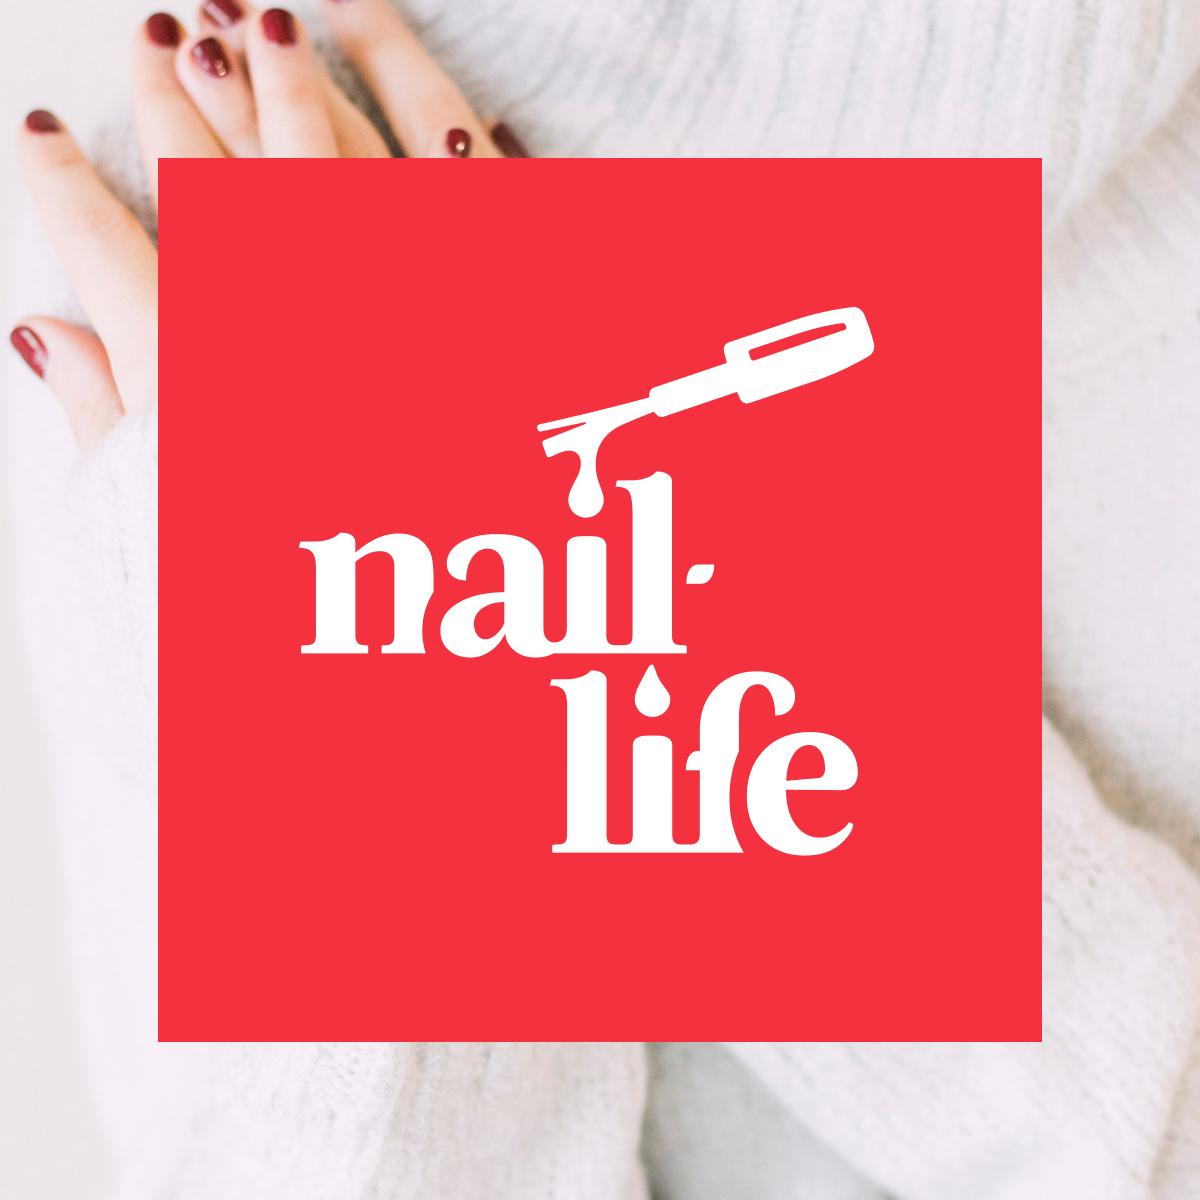 Naillife logo